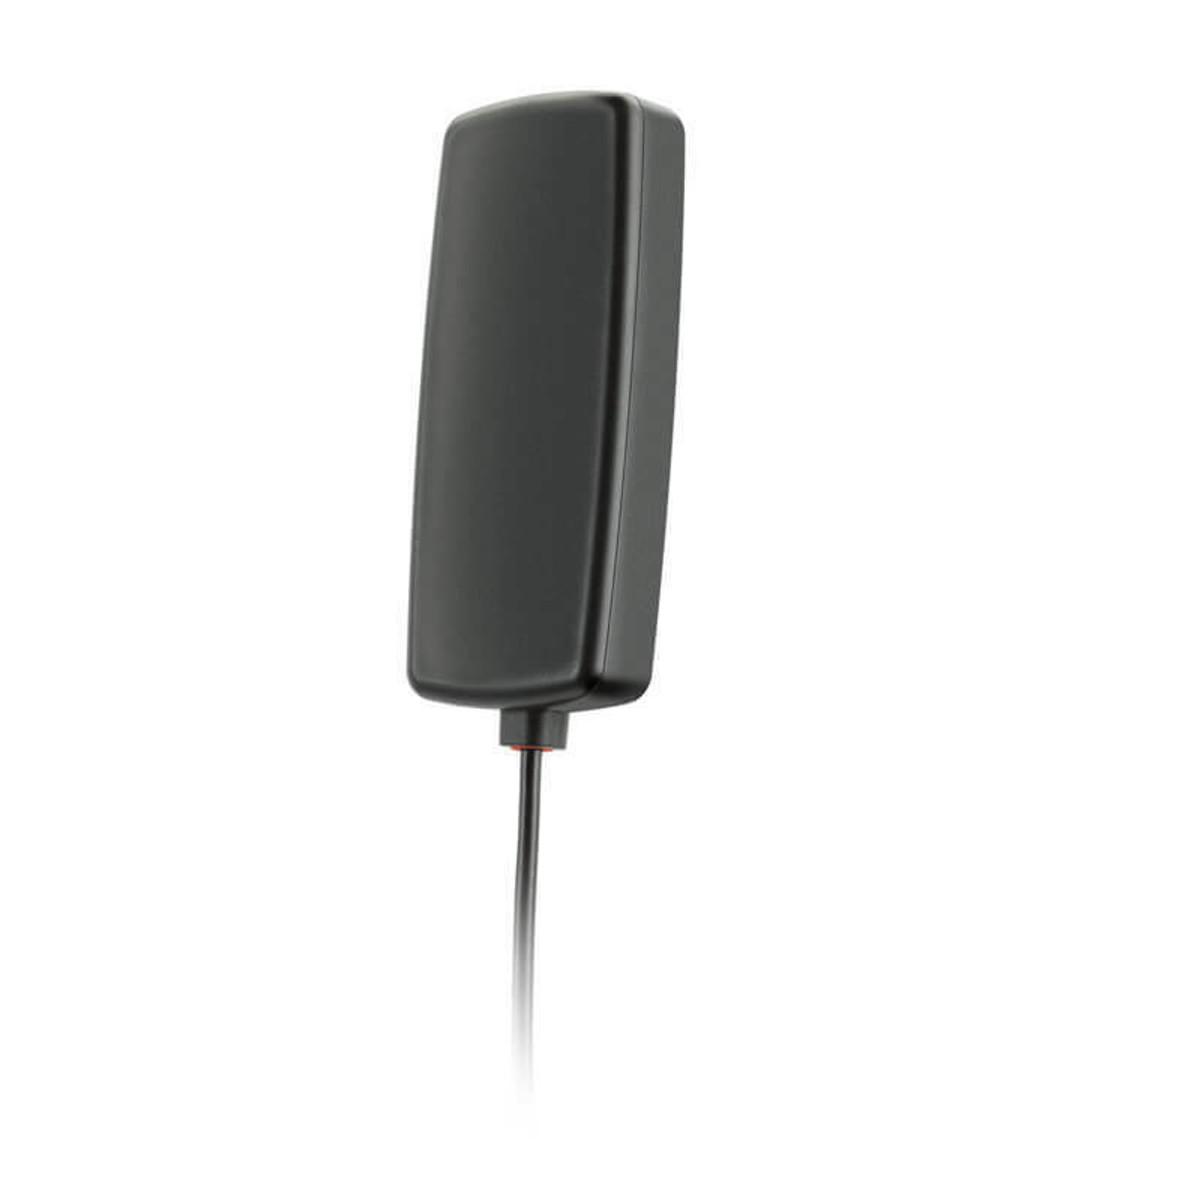 Wilson Electronics Wilson 4G Slim Low-Profile Antenna, 50 Ohm or 314401